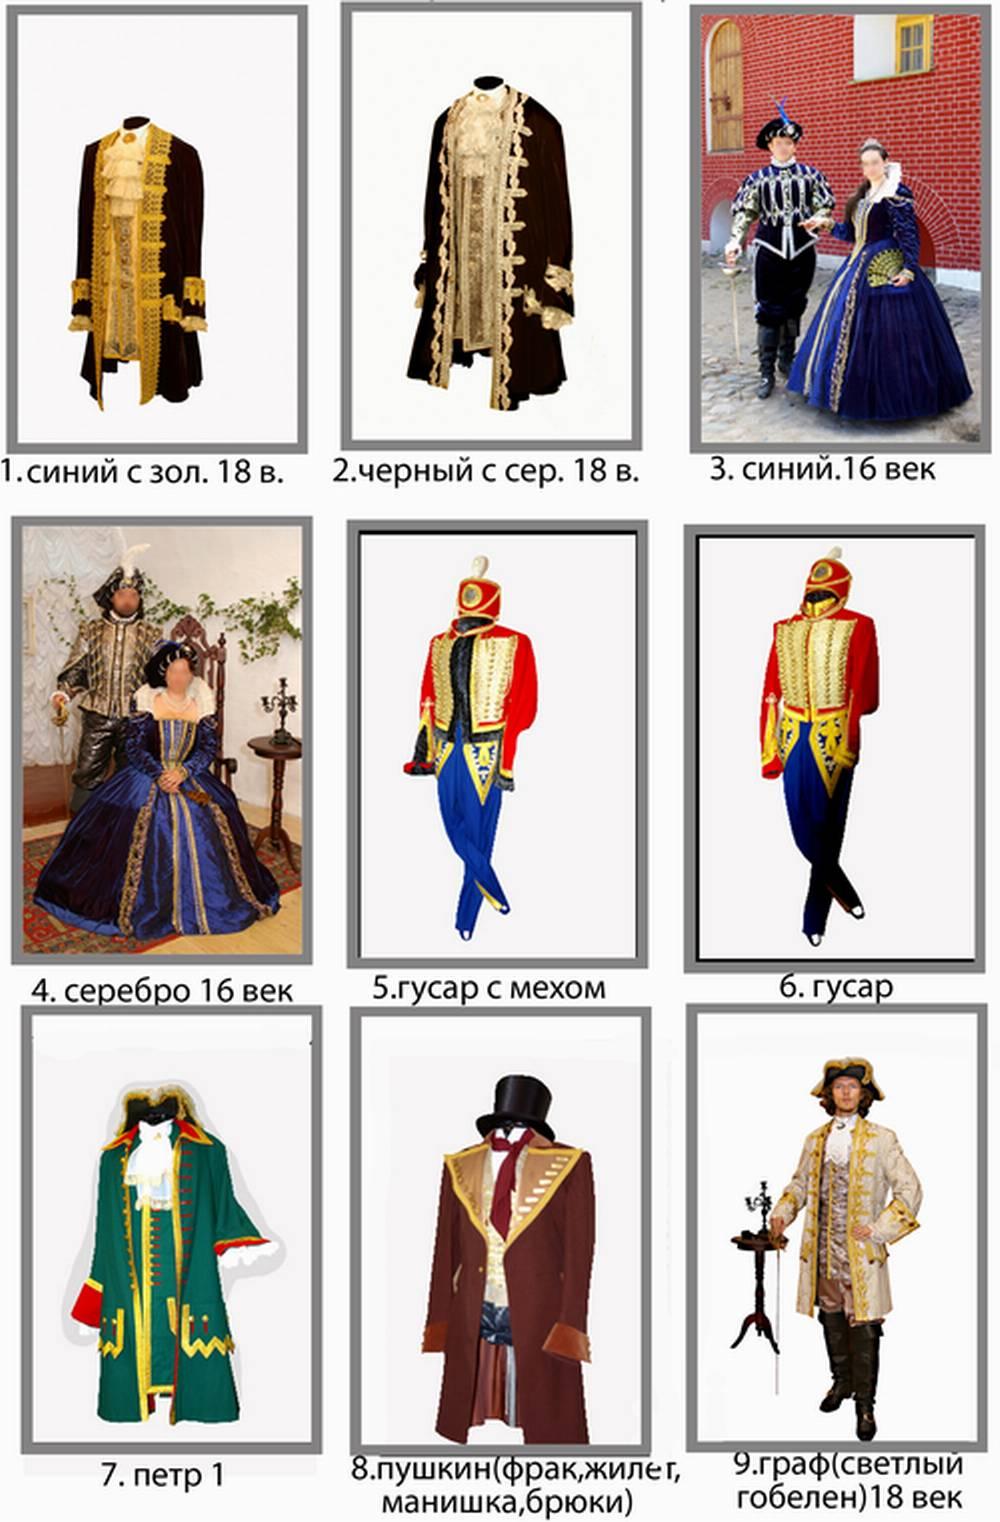 Прокат мужских костюмов спб 2